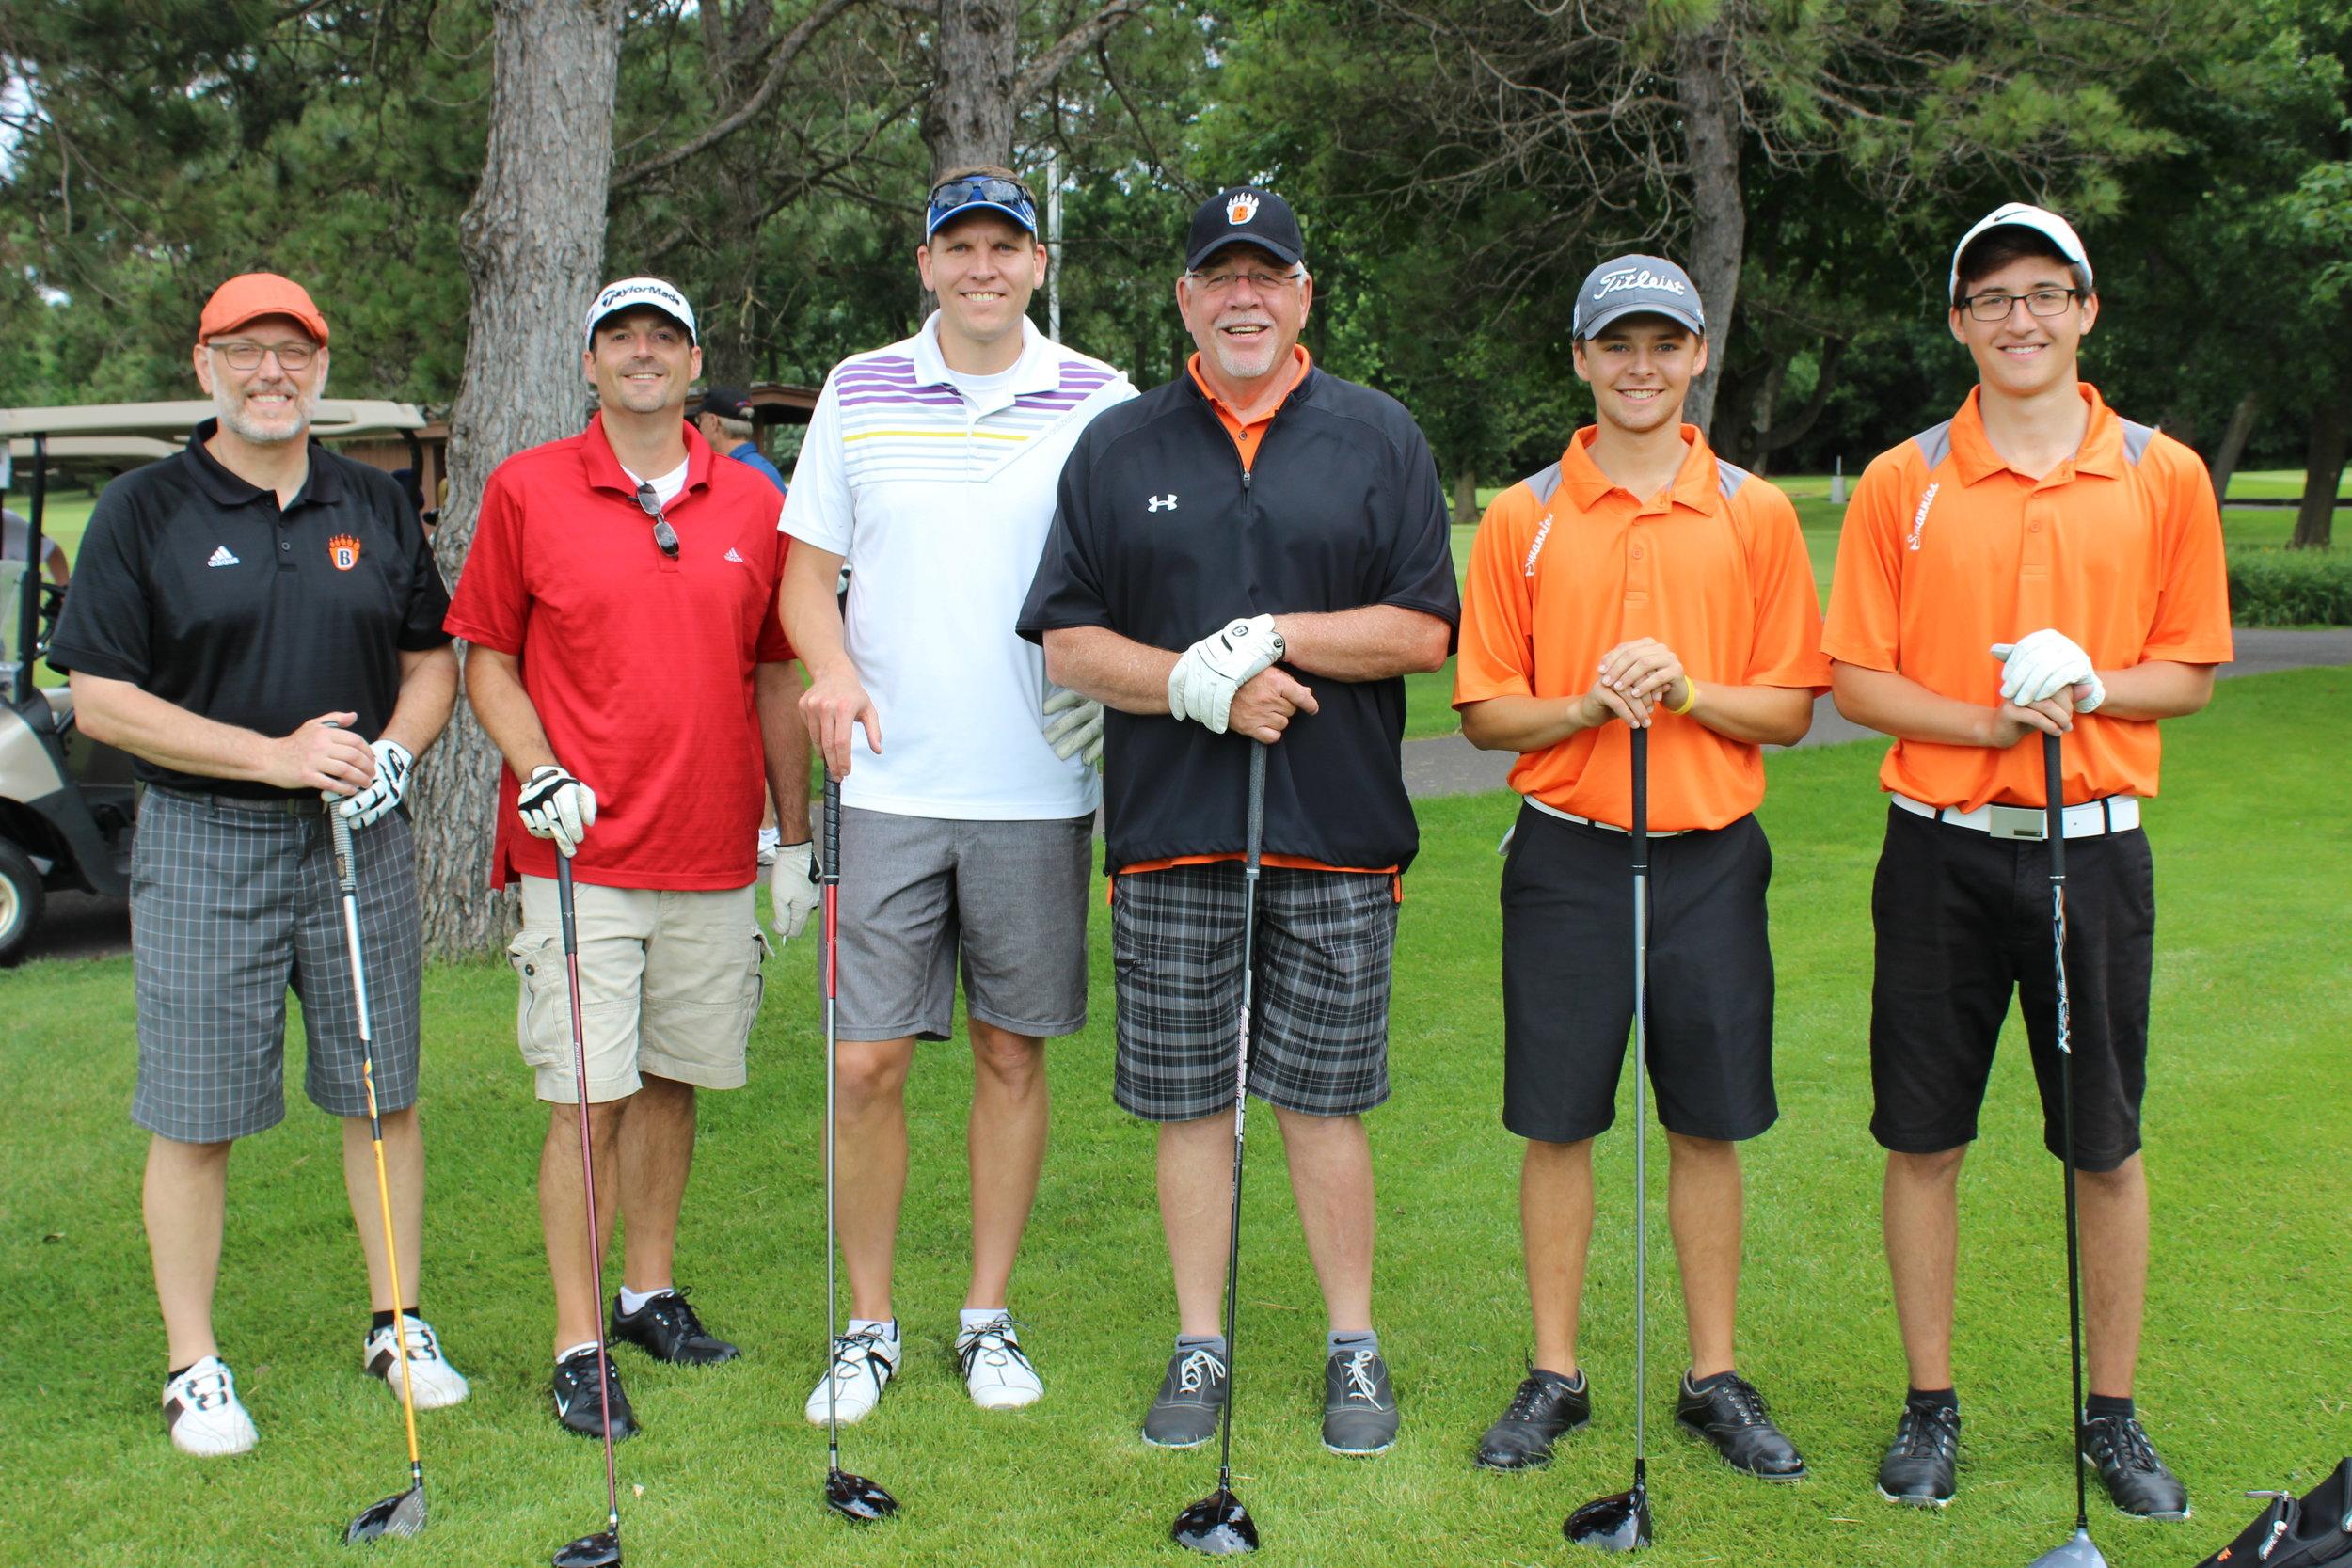 Tim Wald, Cary Krusemark, Matt Menier, Tim Hermann with WBLAS boys golfers.jpg